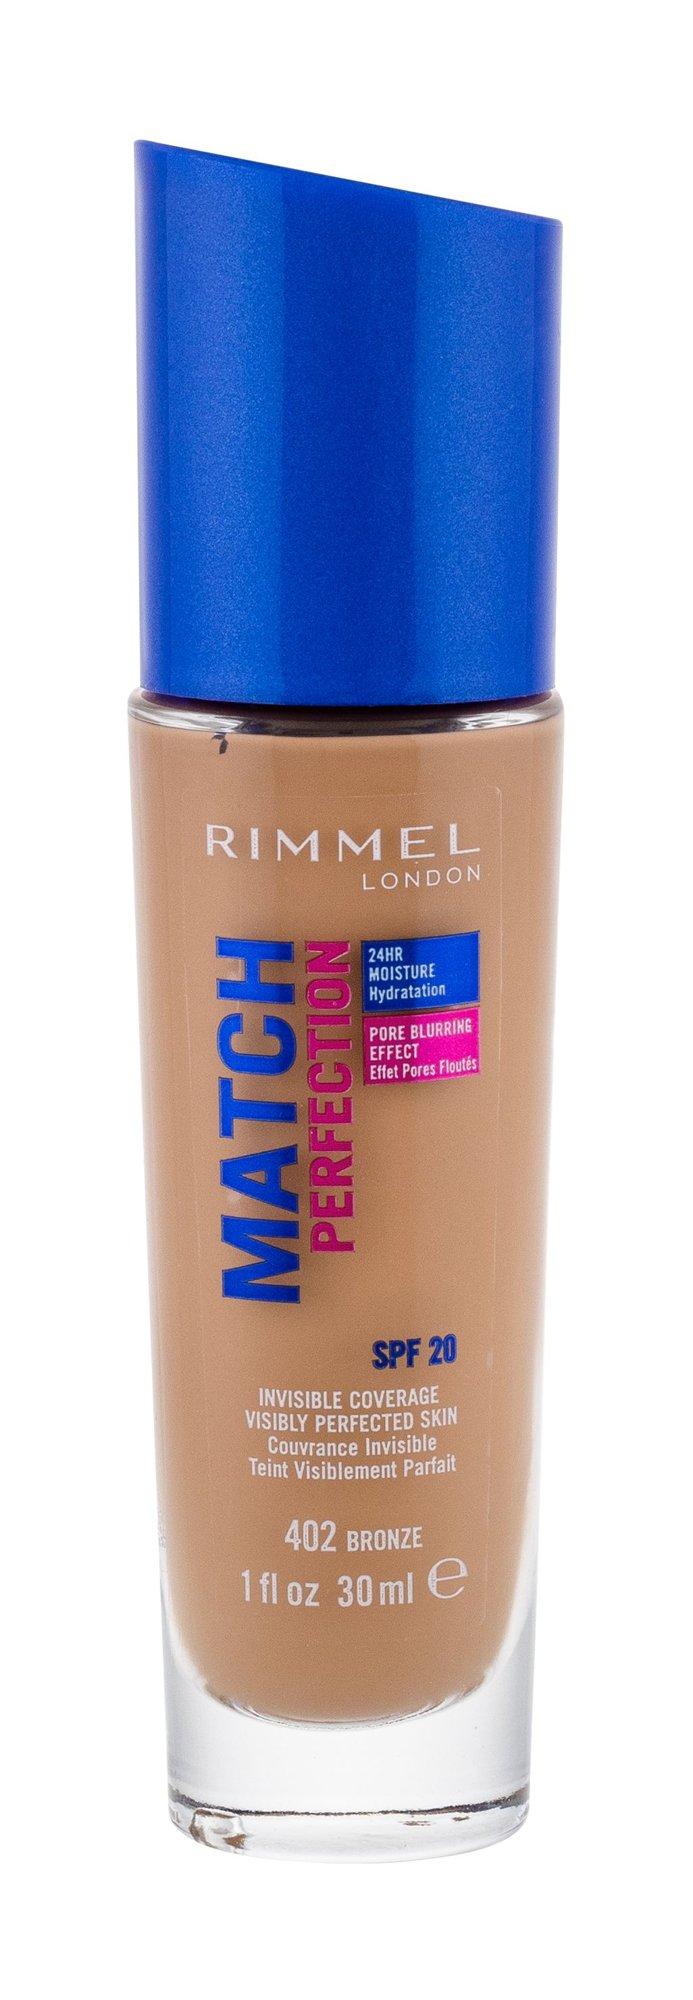 Rimmel London Match Perfection Makeup 30ml 402 Bronze